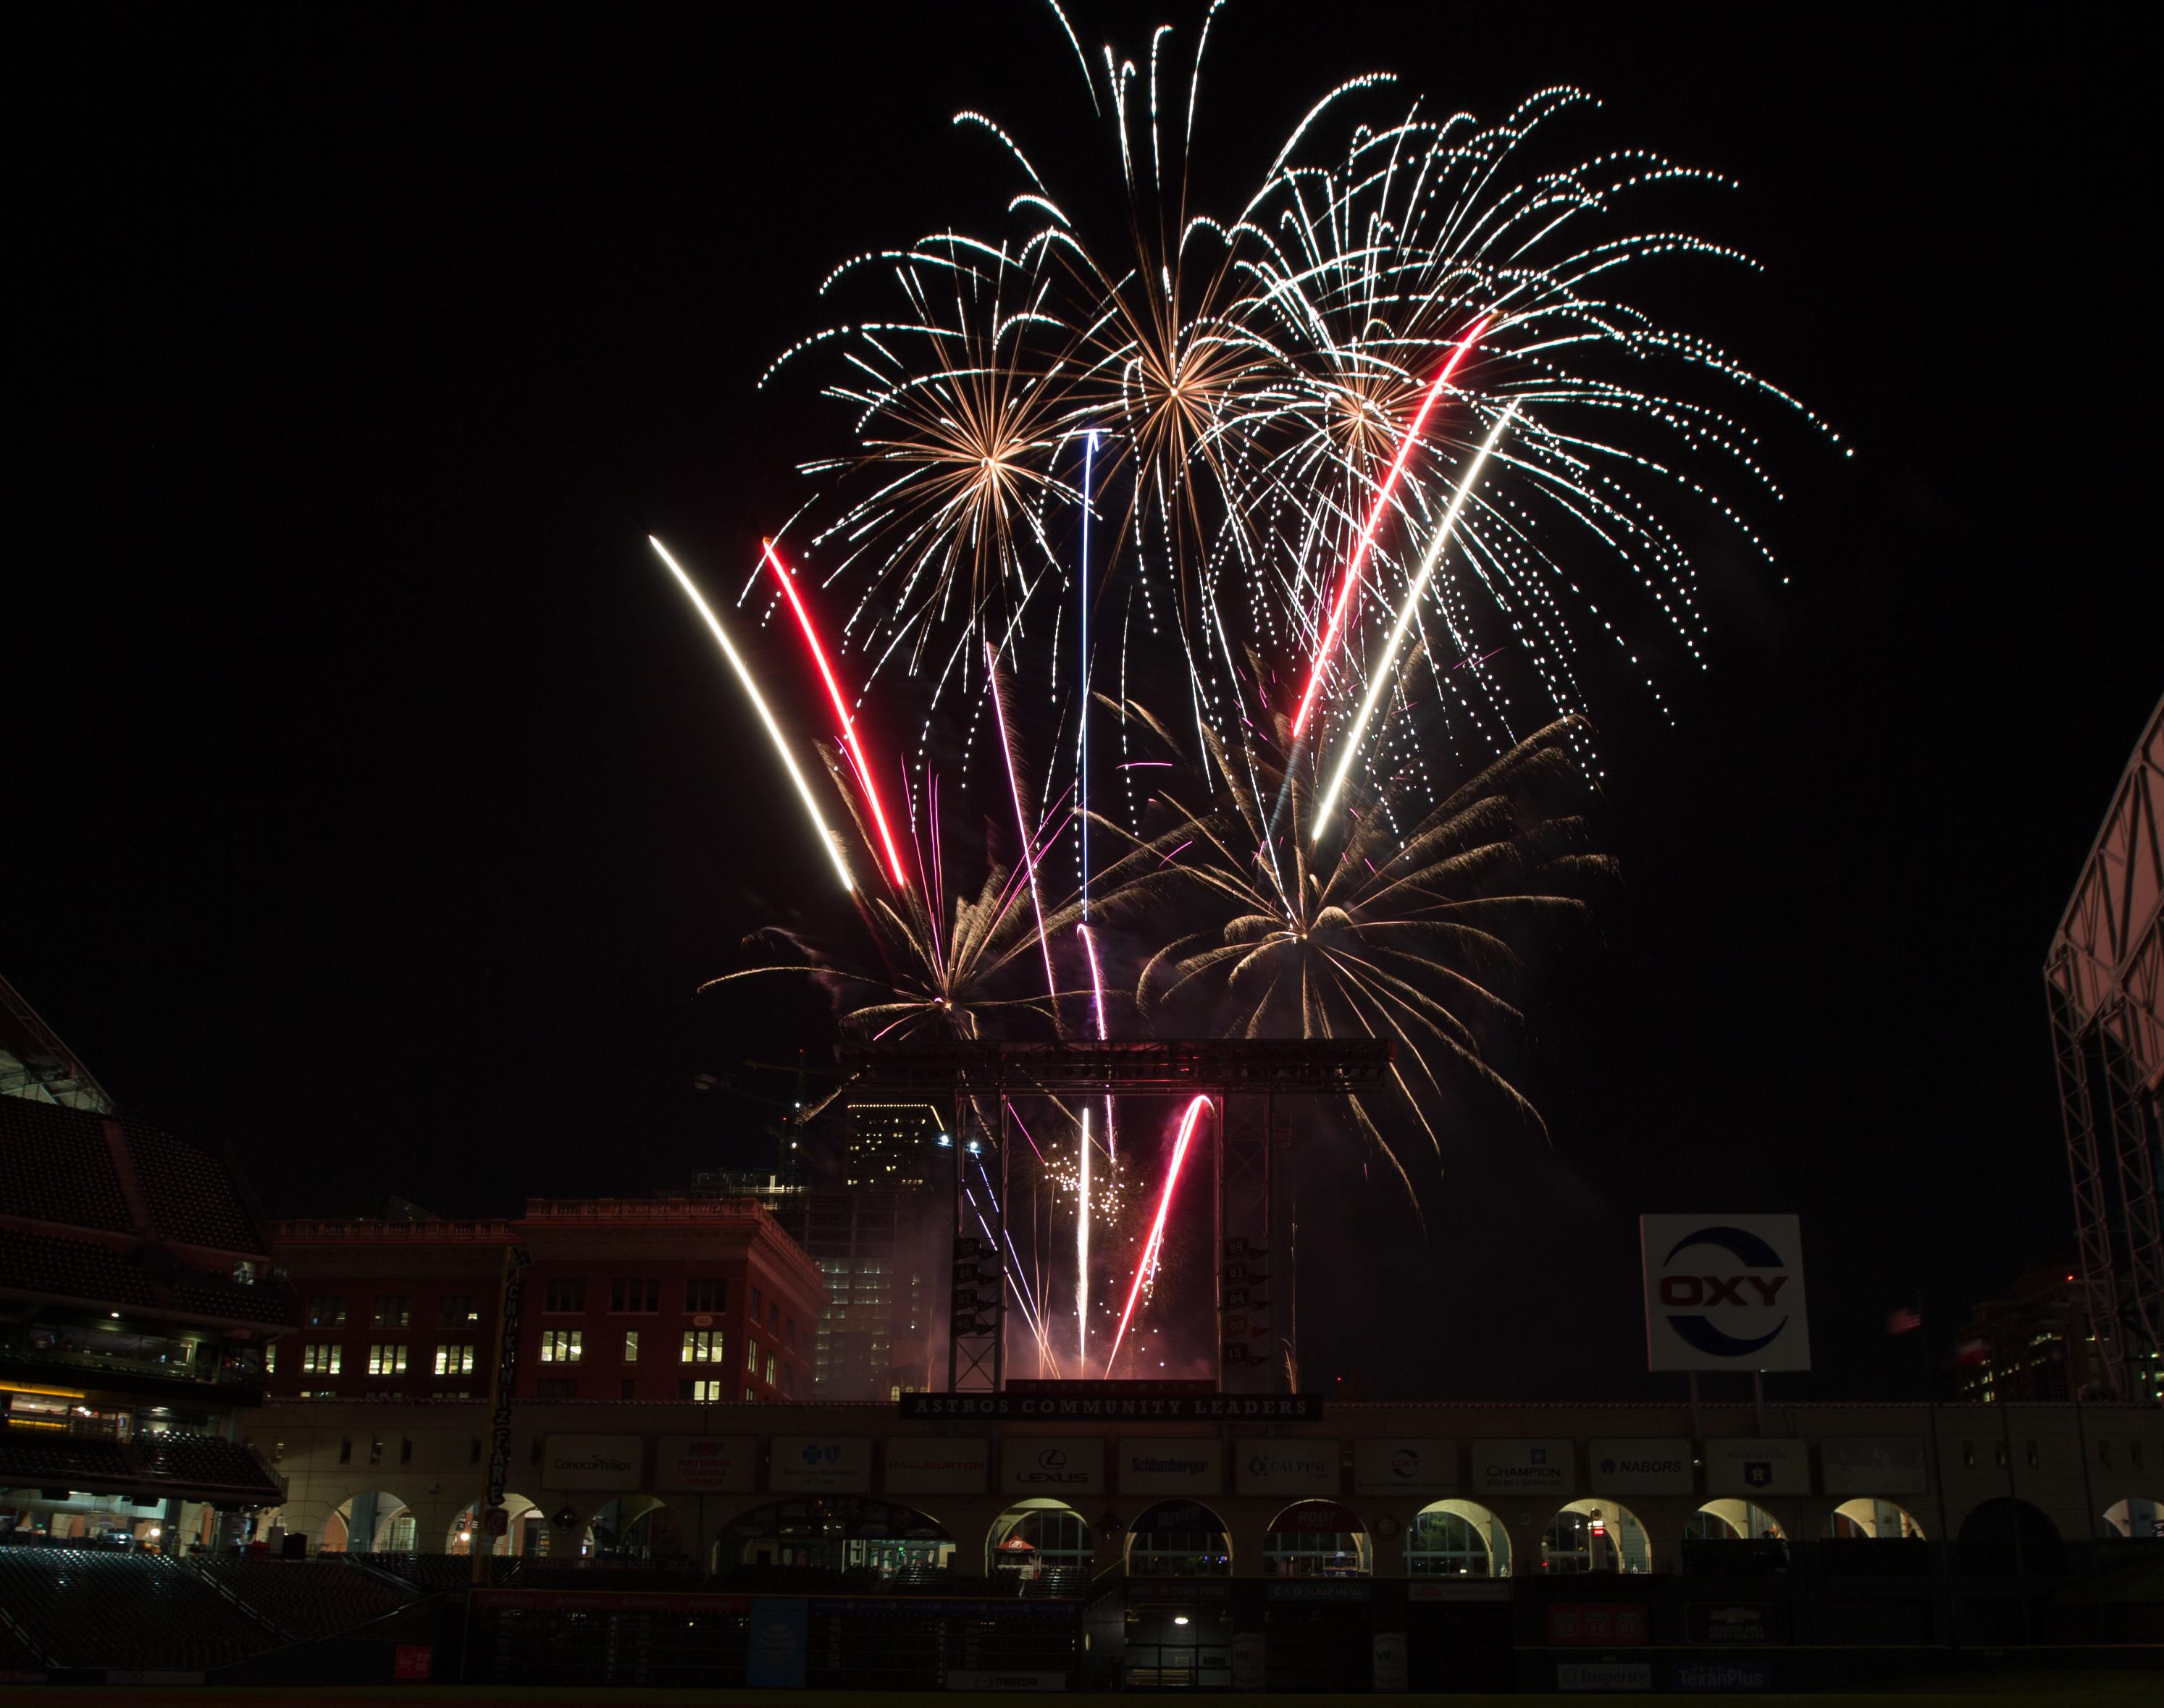 MLB: JUL 01 White Sox at Astros